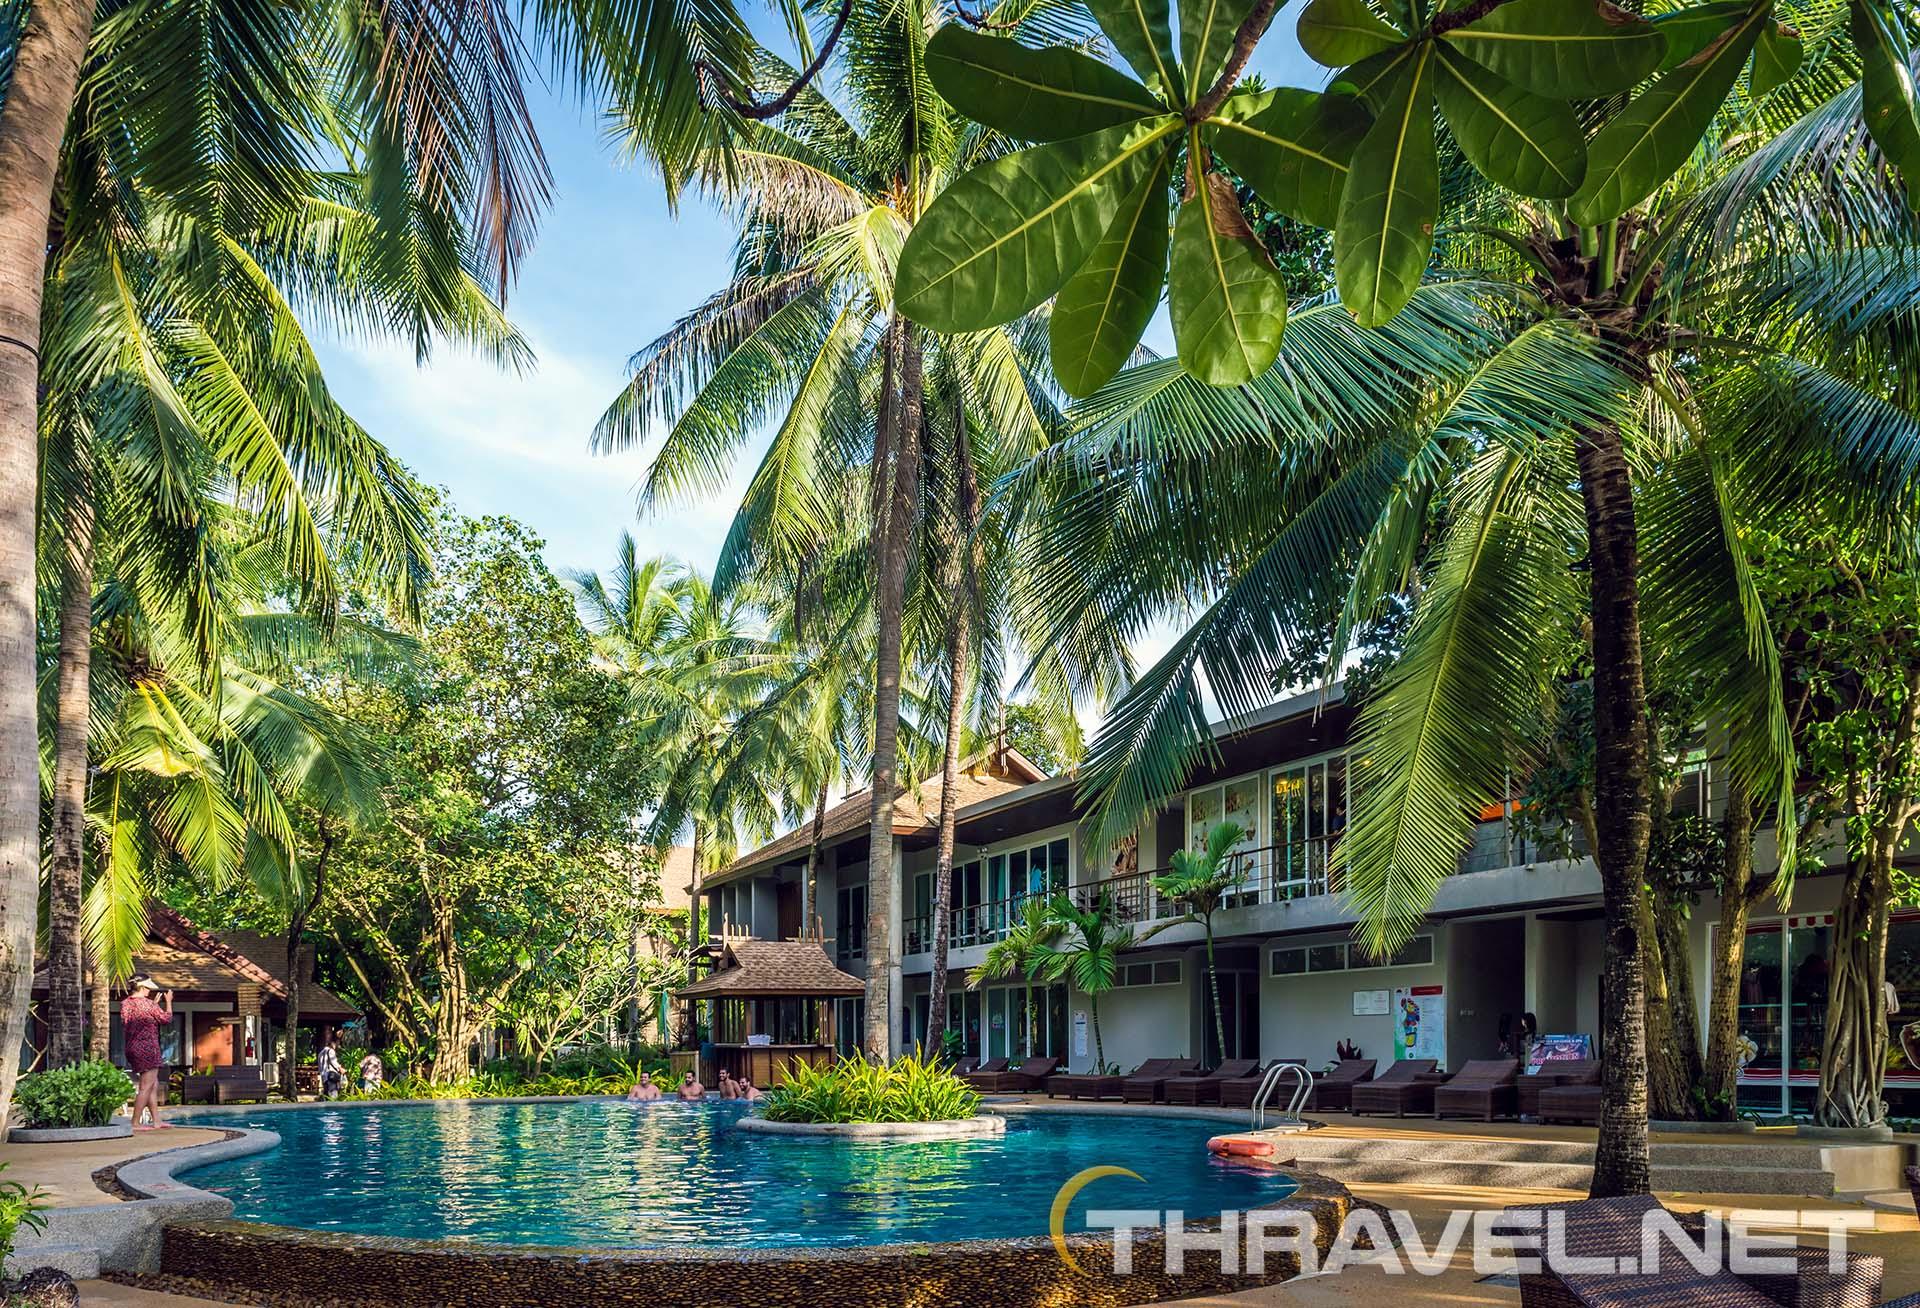 Railey-beach-hotels-pool